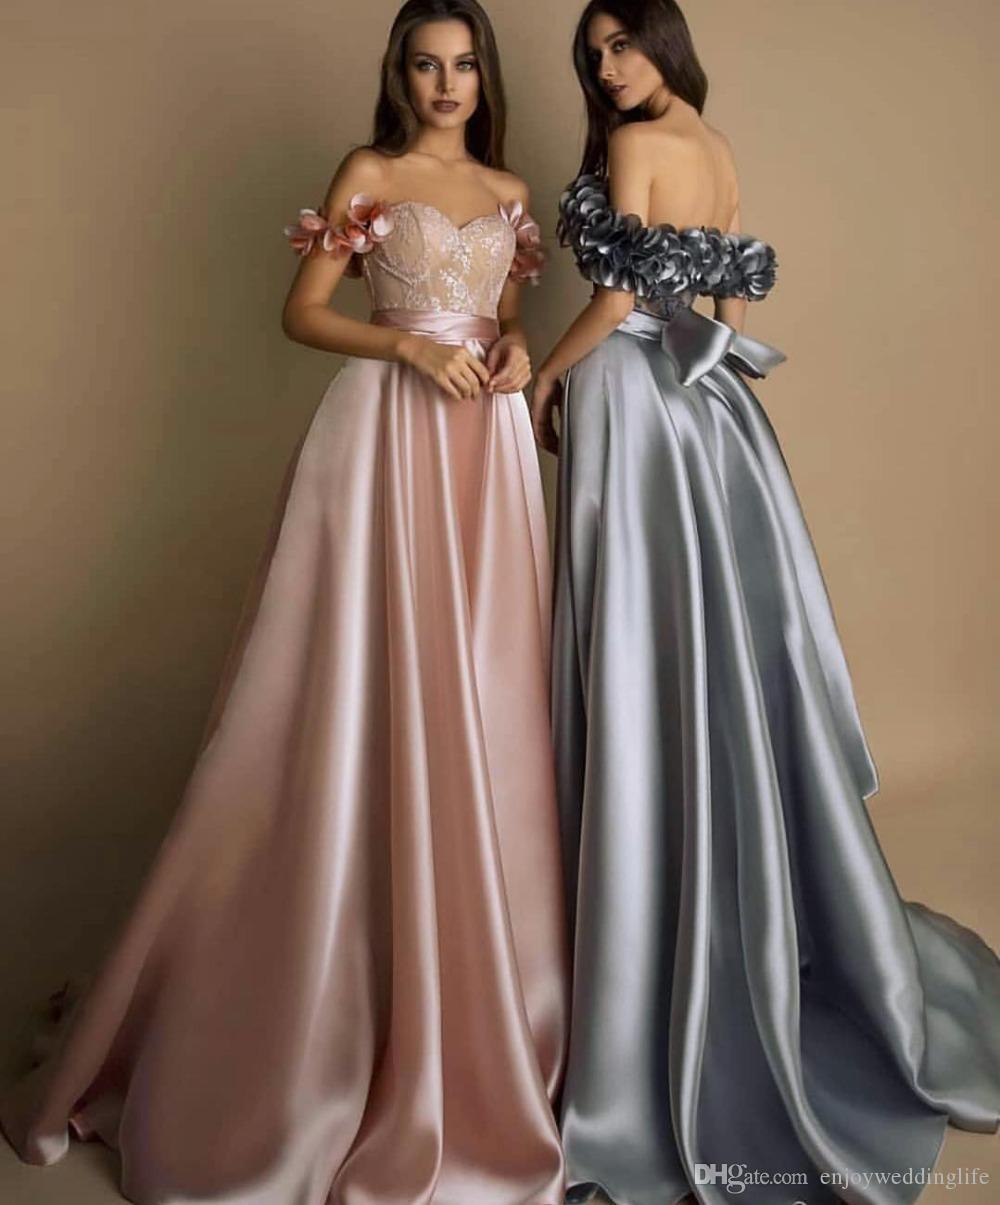 Satin Vintage Pink Prom Dresses 2020 Elegant Formal Party Dress Long Ribbons Evening Gown Vestido De Noche